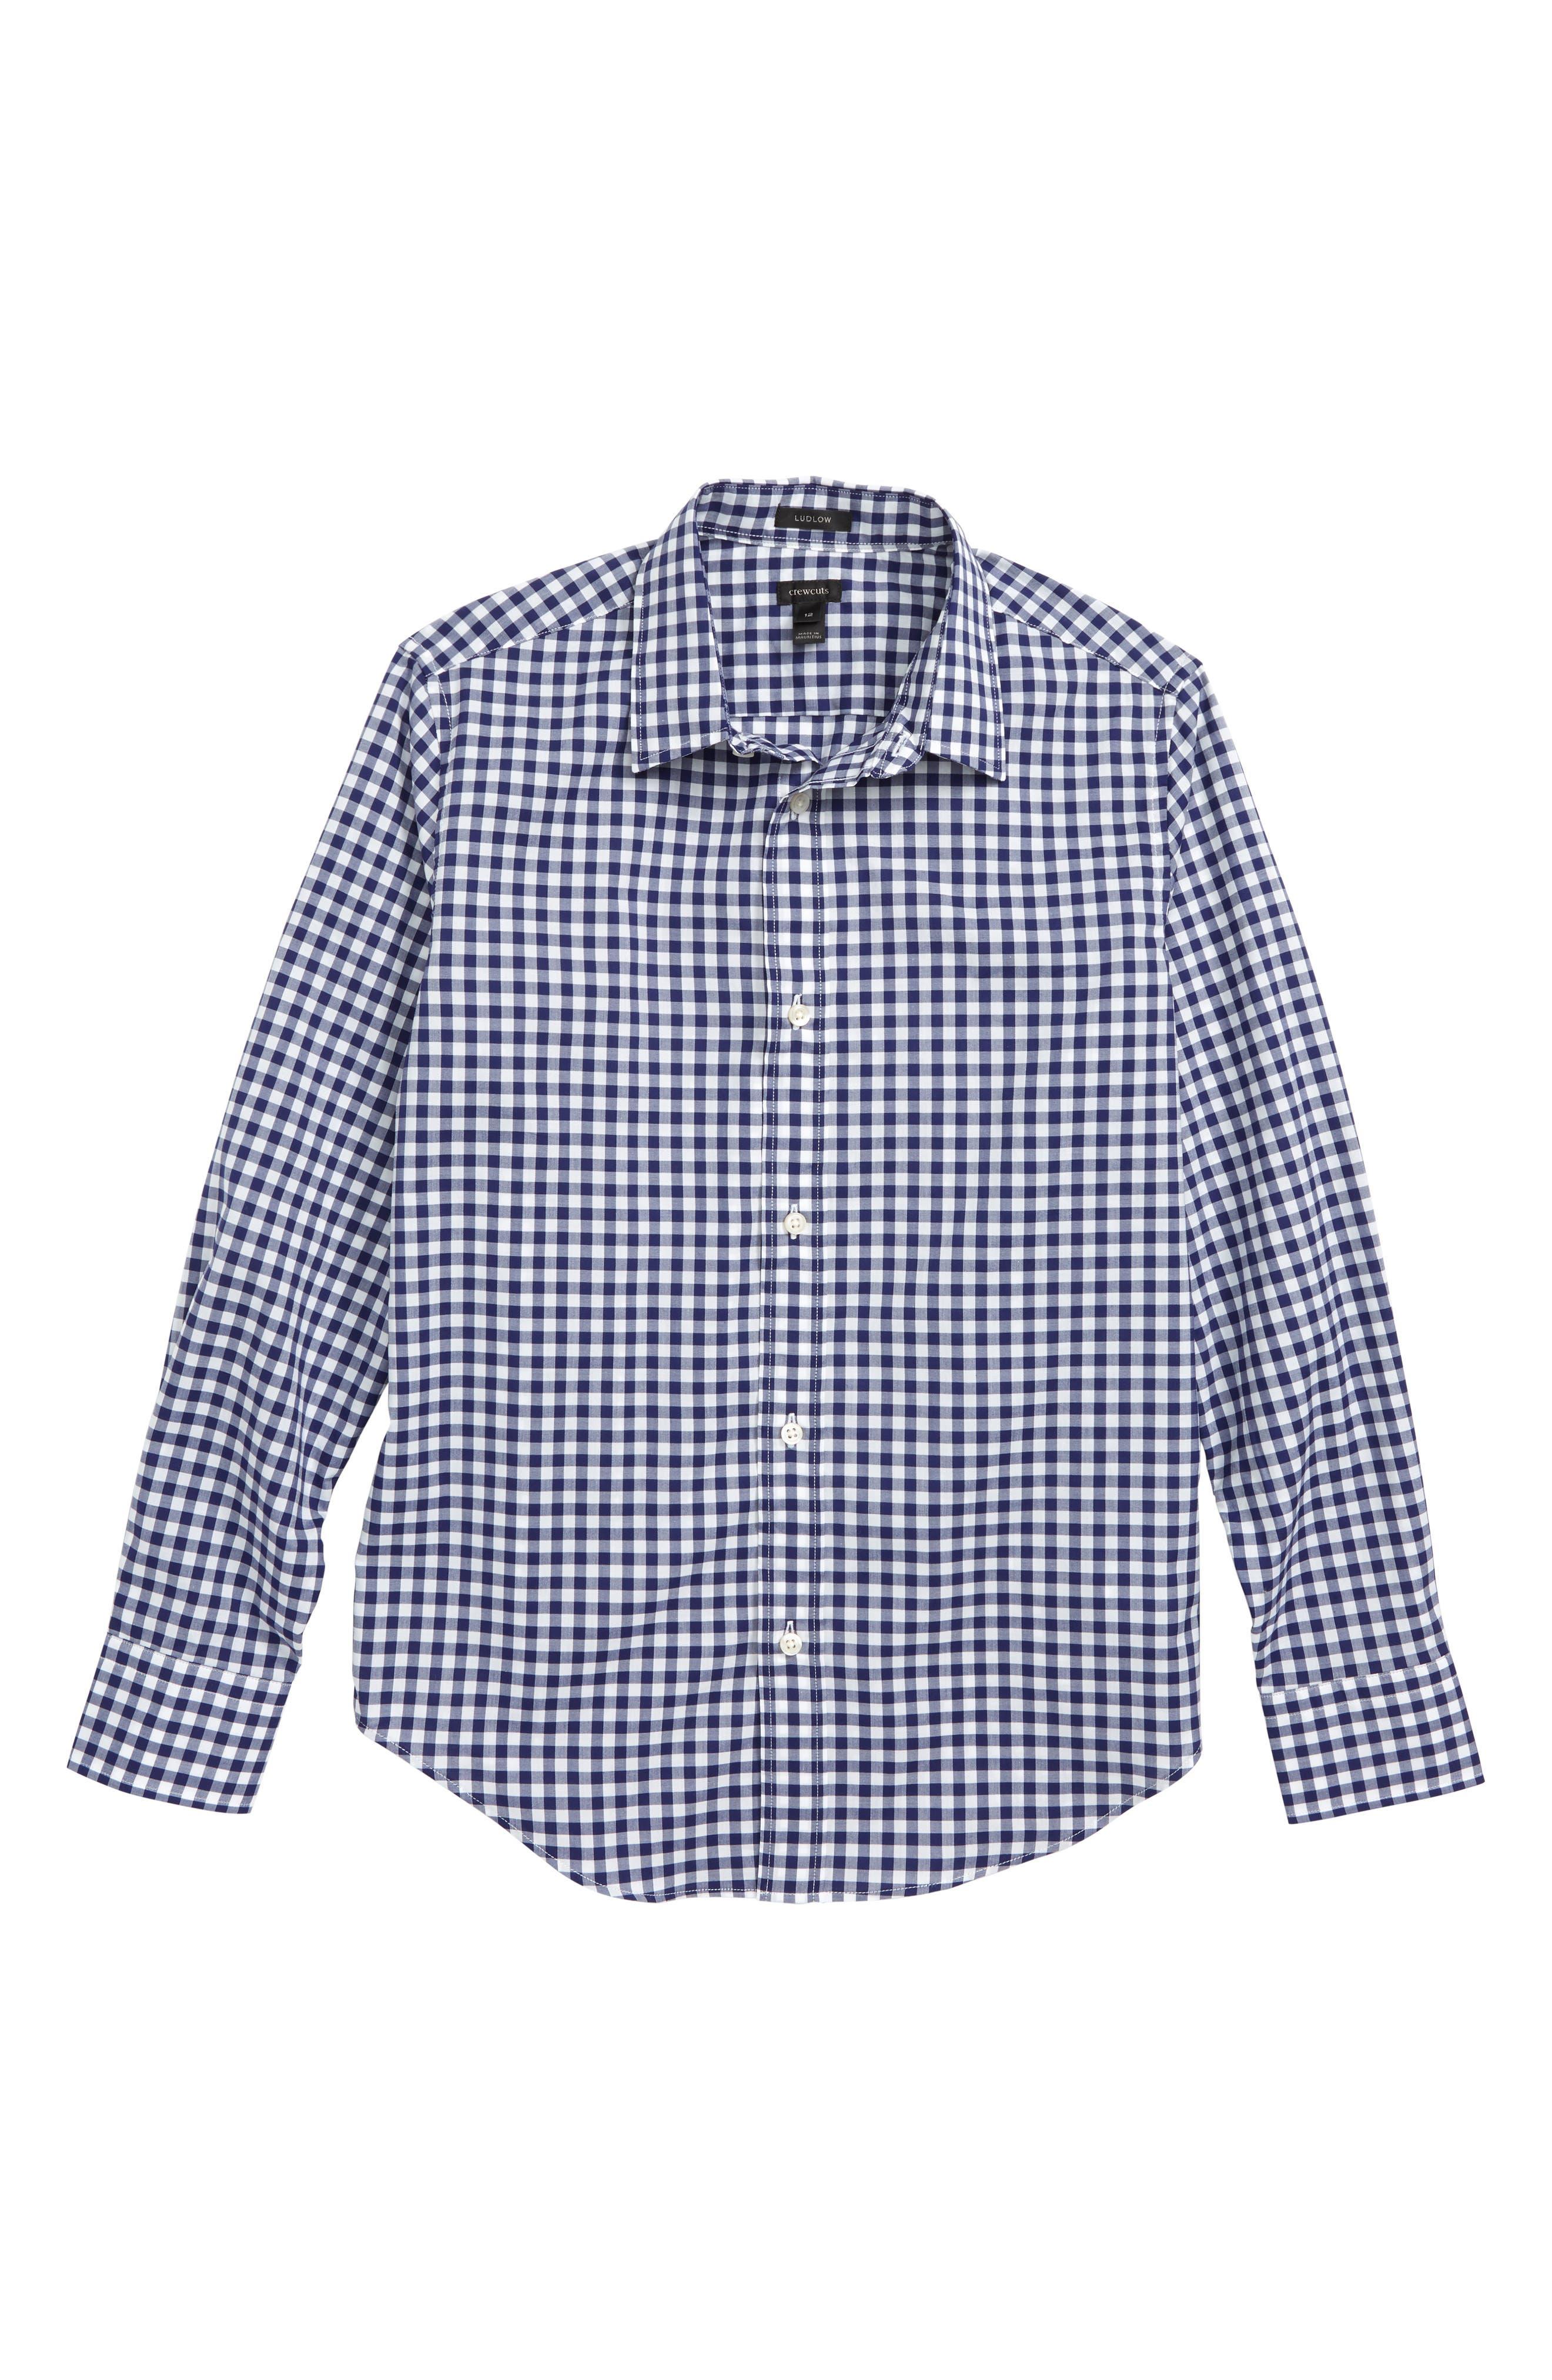 Ludlow Stripe Dress Shirt,                         Main,                         color, 400